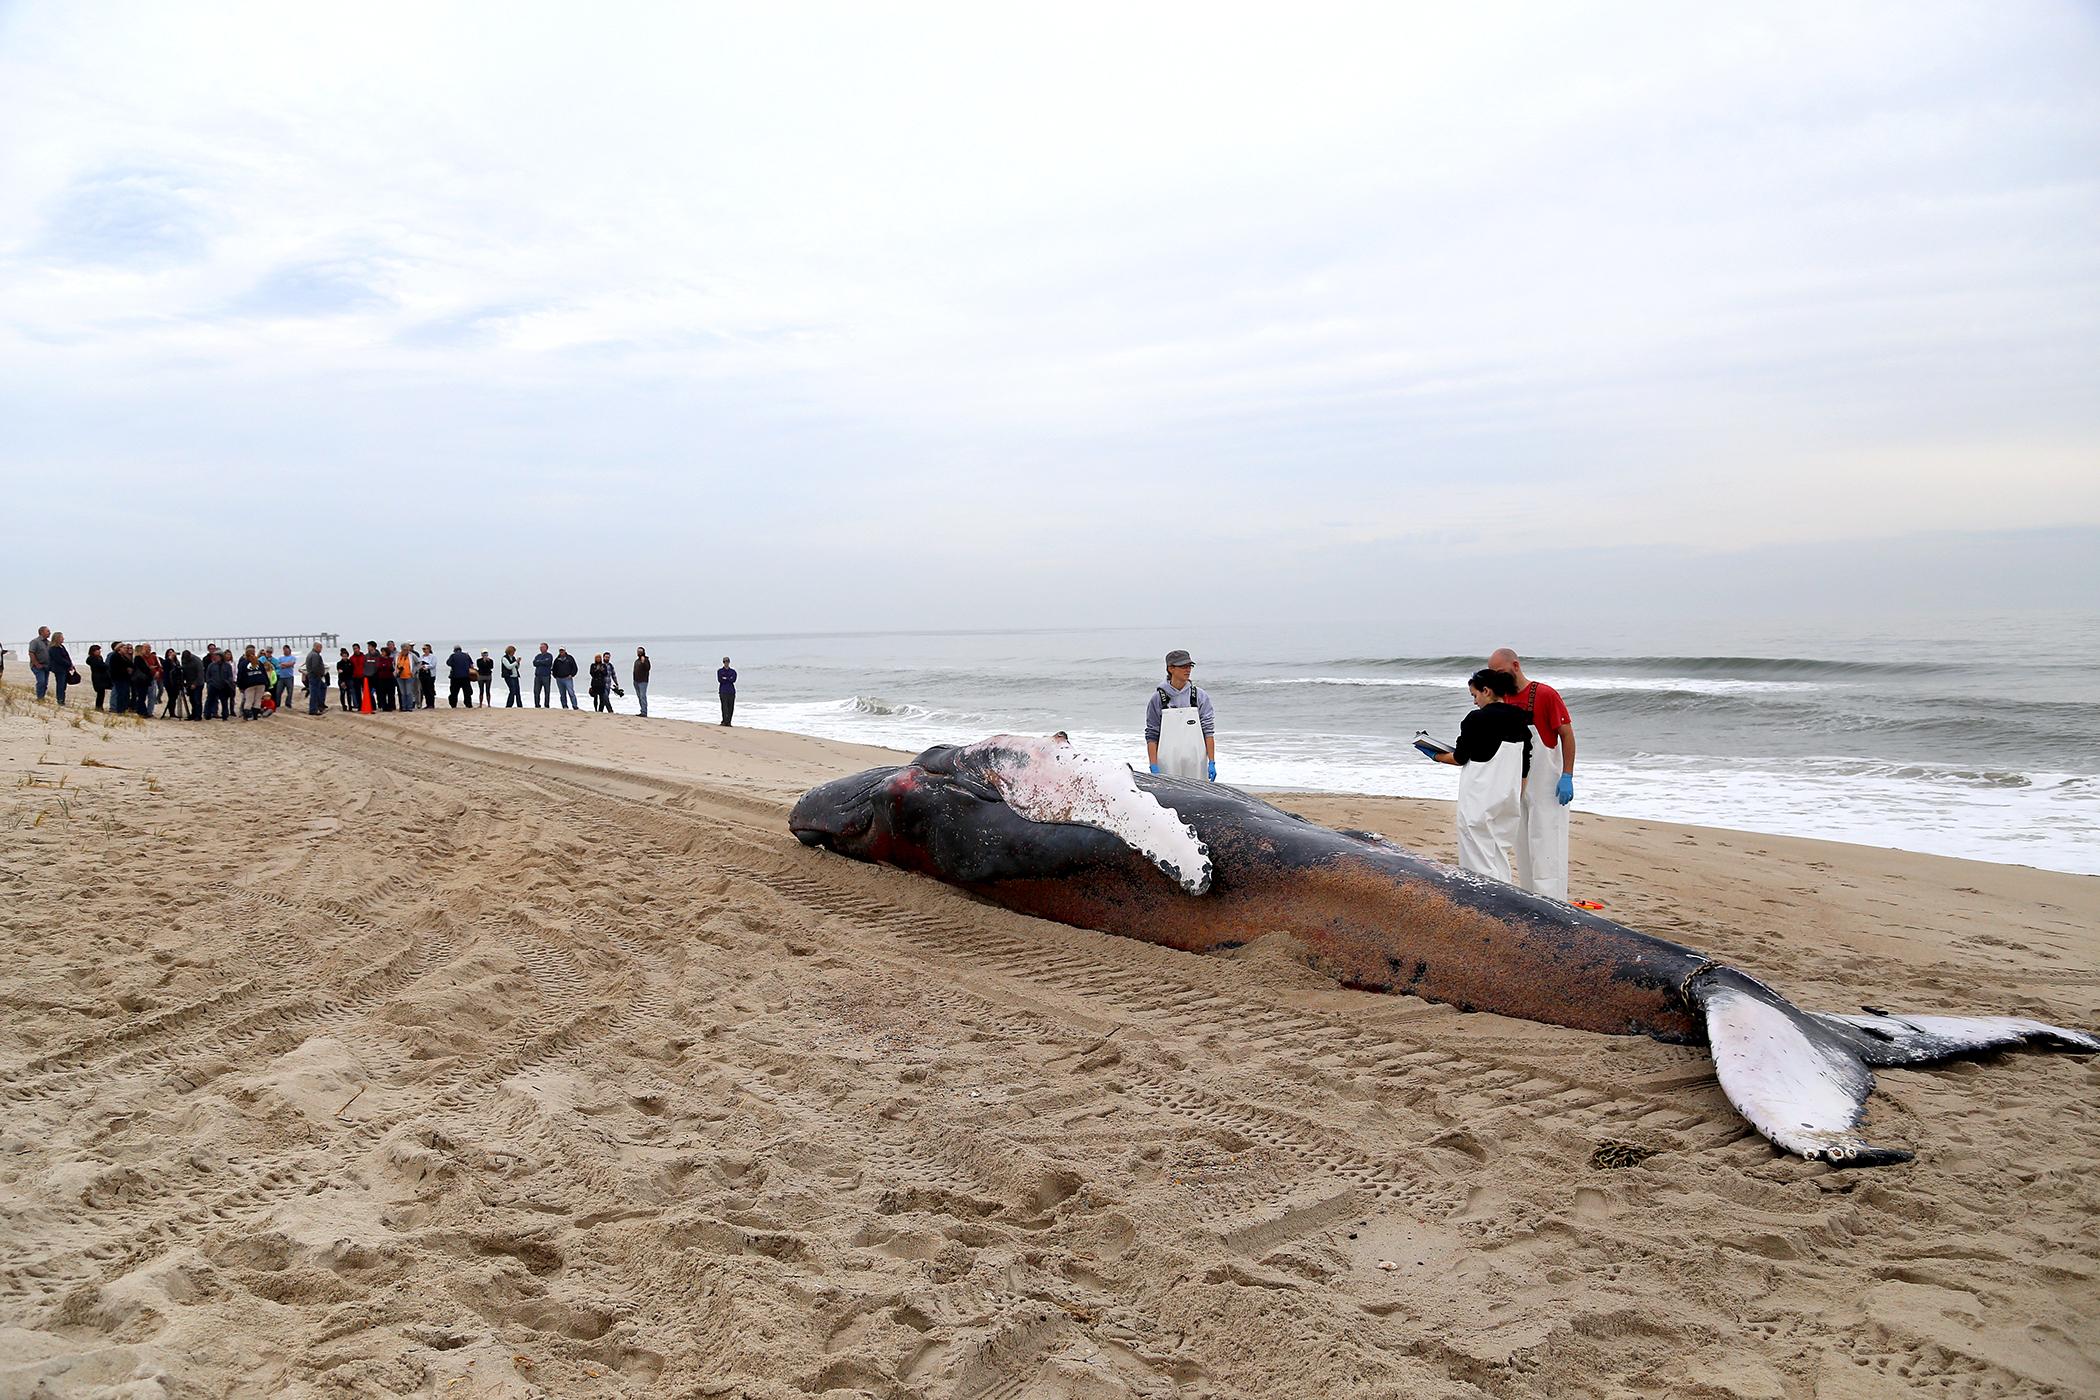 Humpback Whale Washes Up On Kure Beach Lumina News